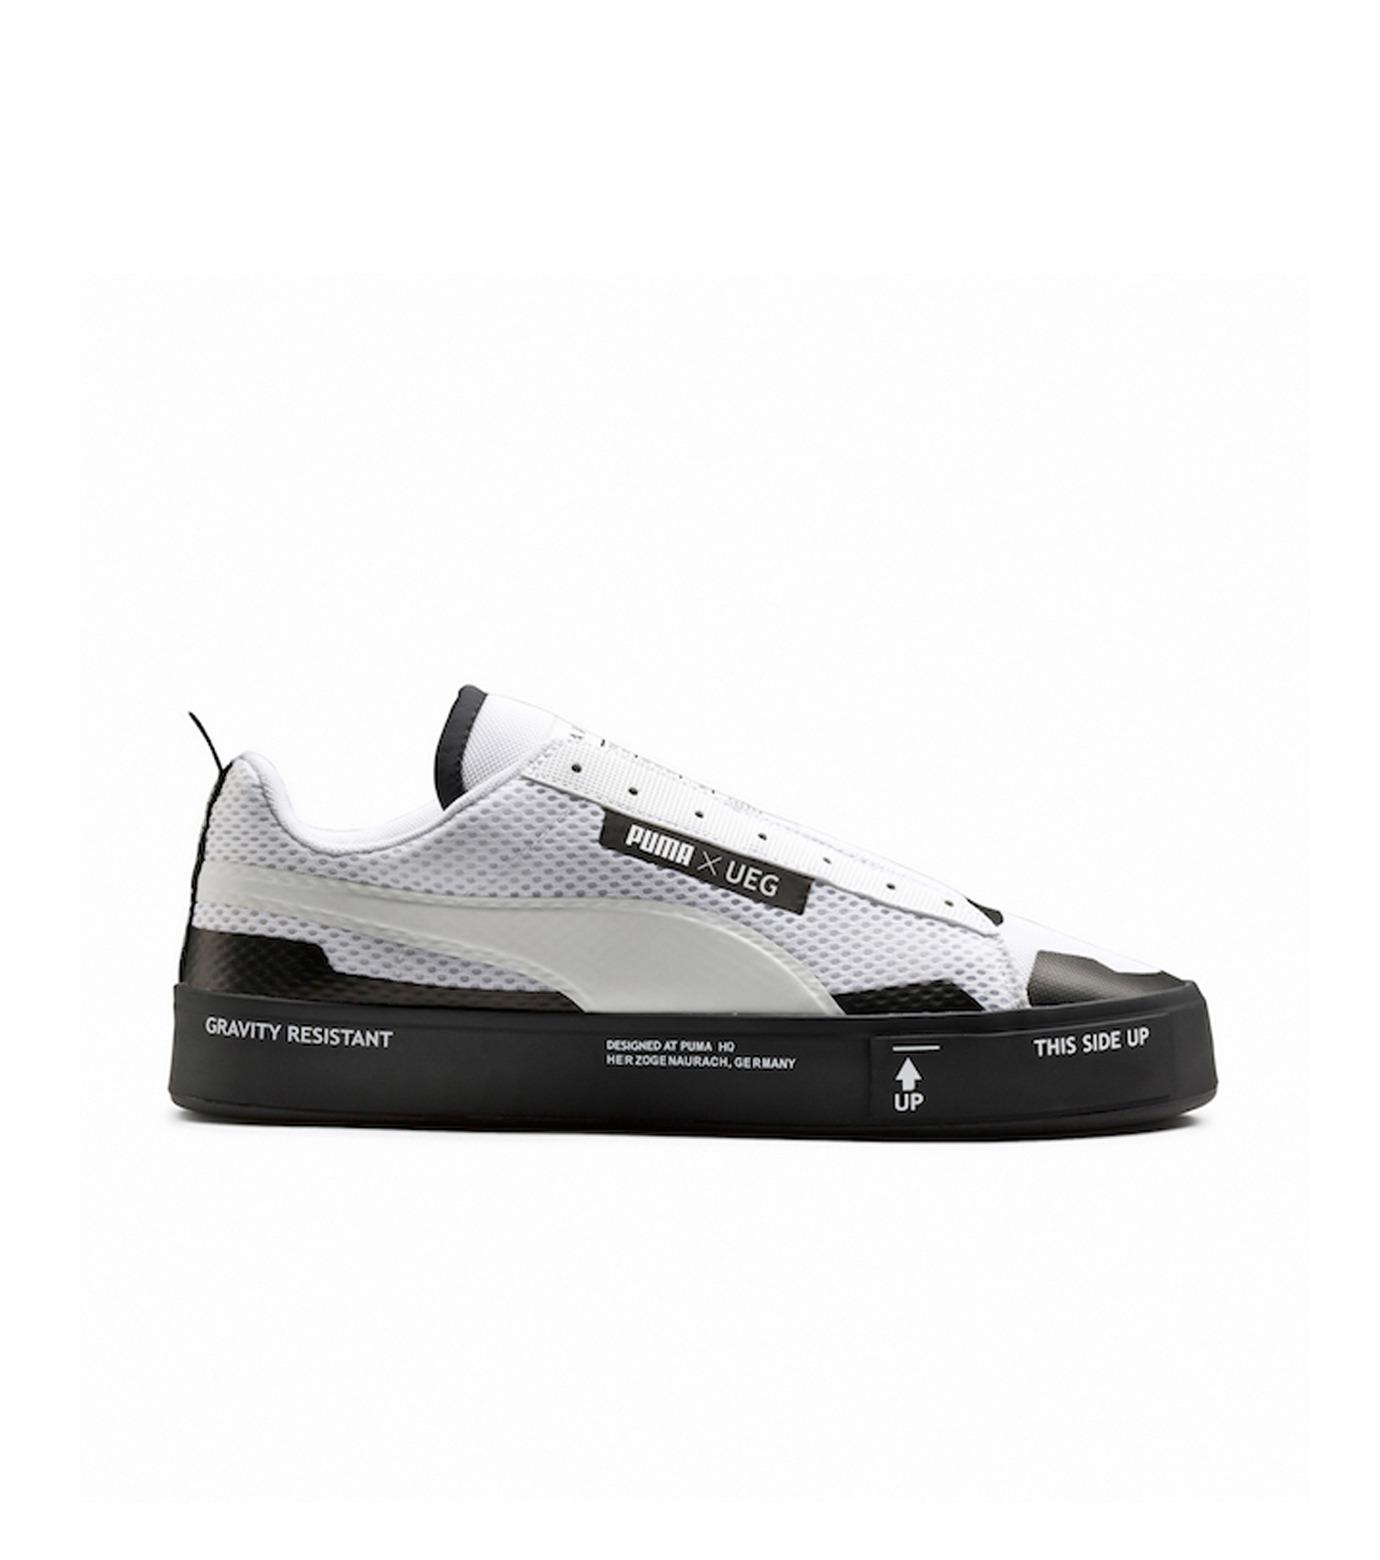 PUMA(プーマ)のCOURT PLAY SLIPON X UEG-WHITE(シューズ/shoes)-361637-4 拡大詳細画像1